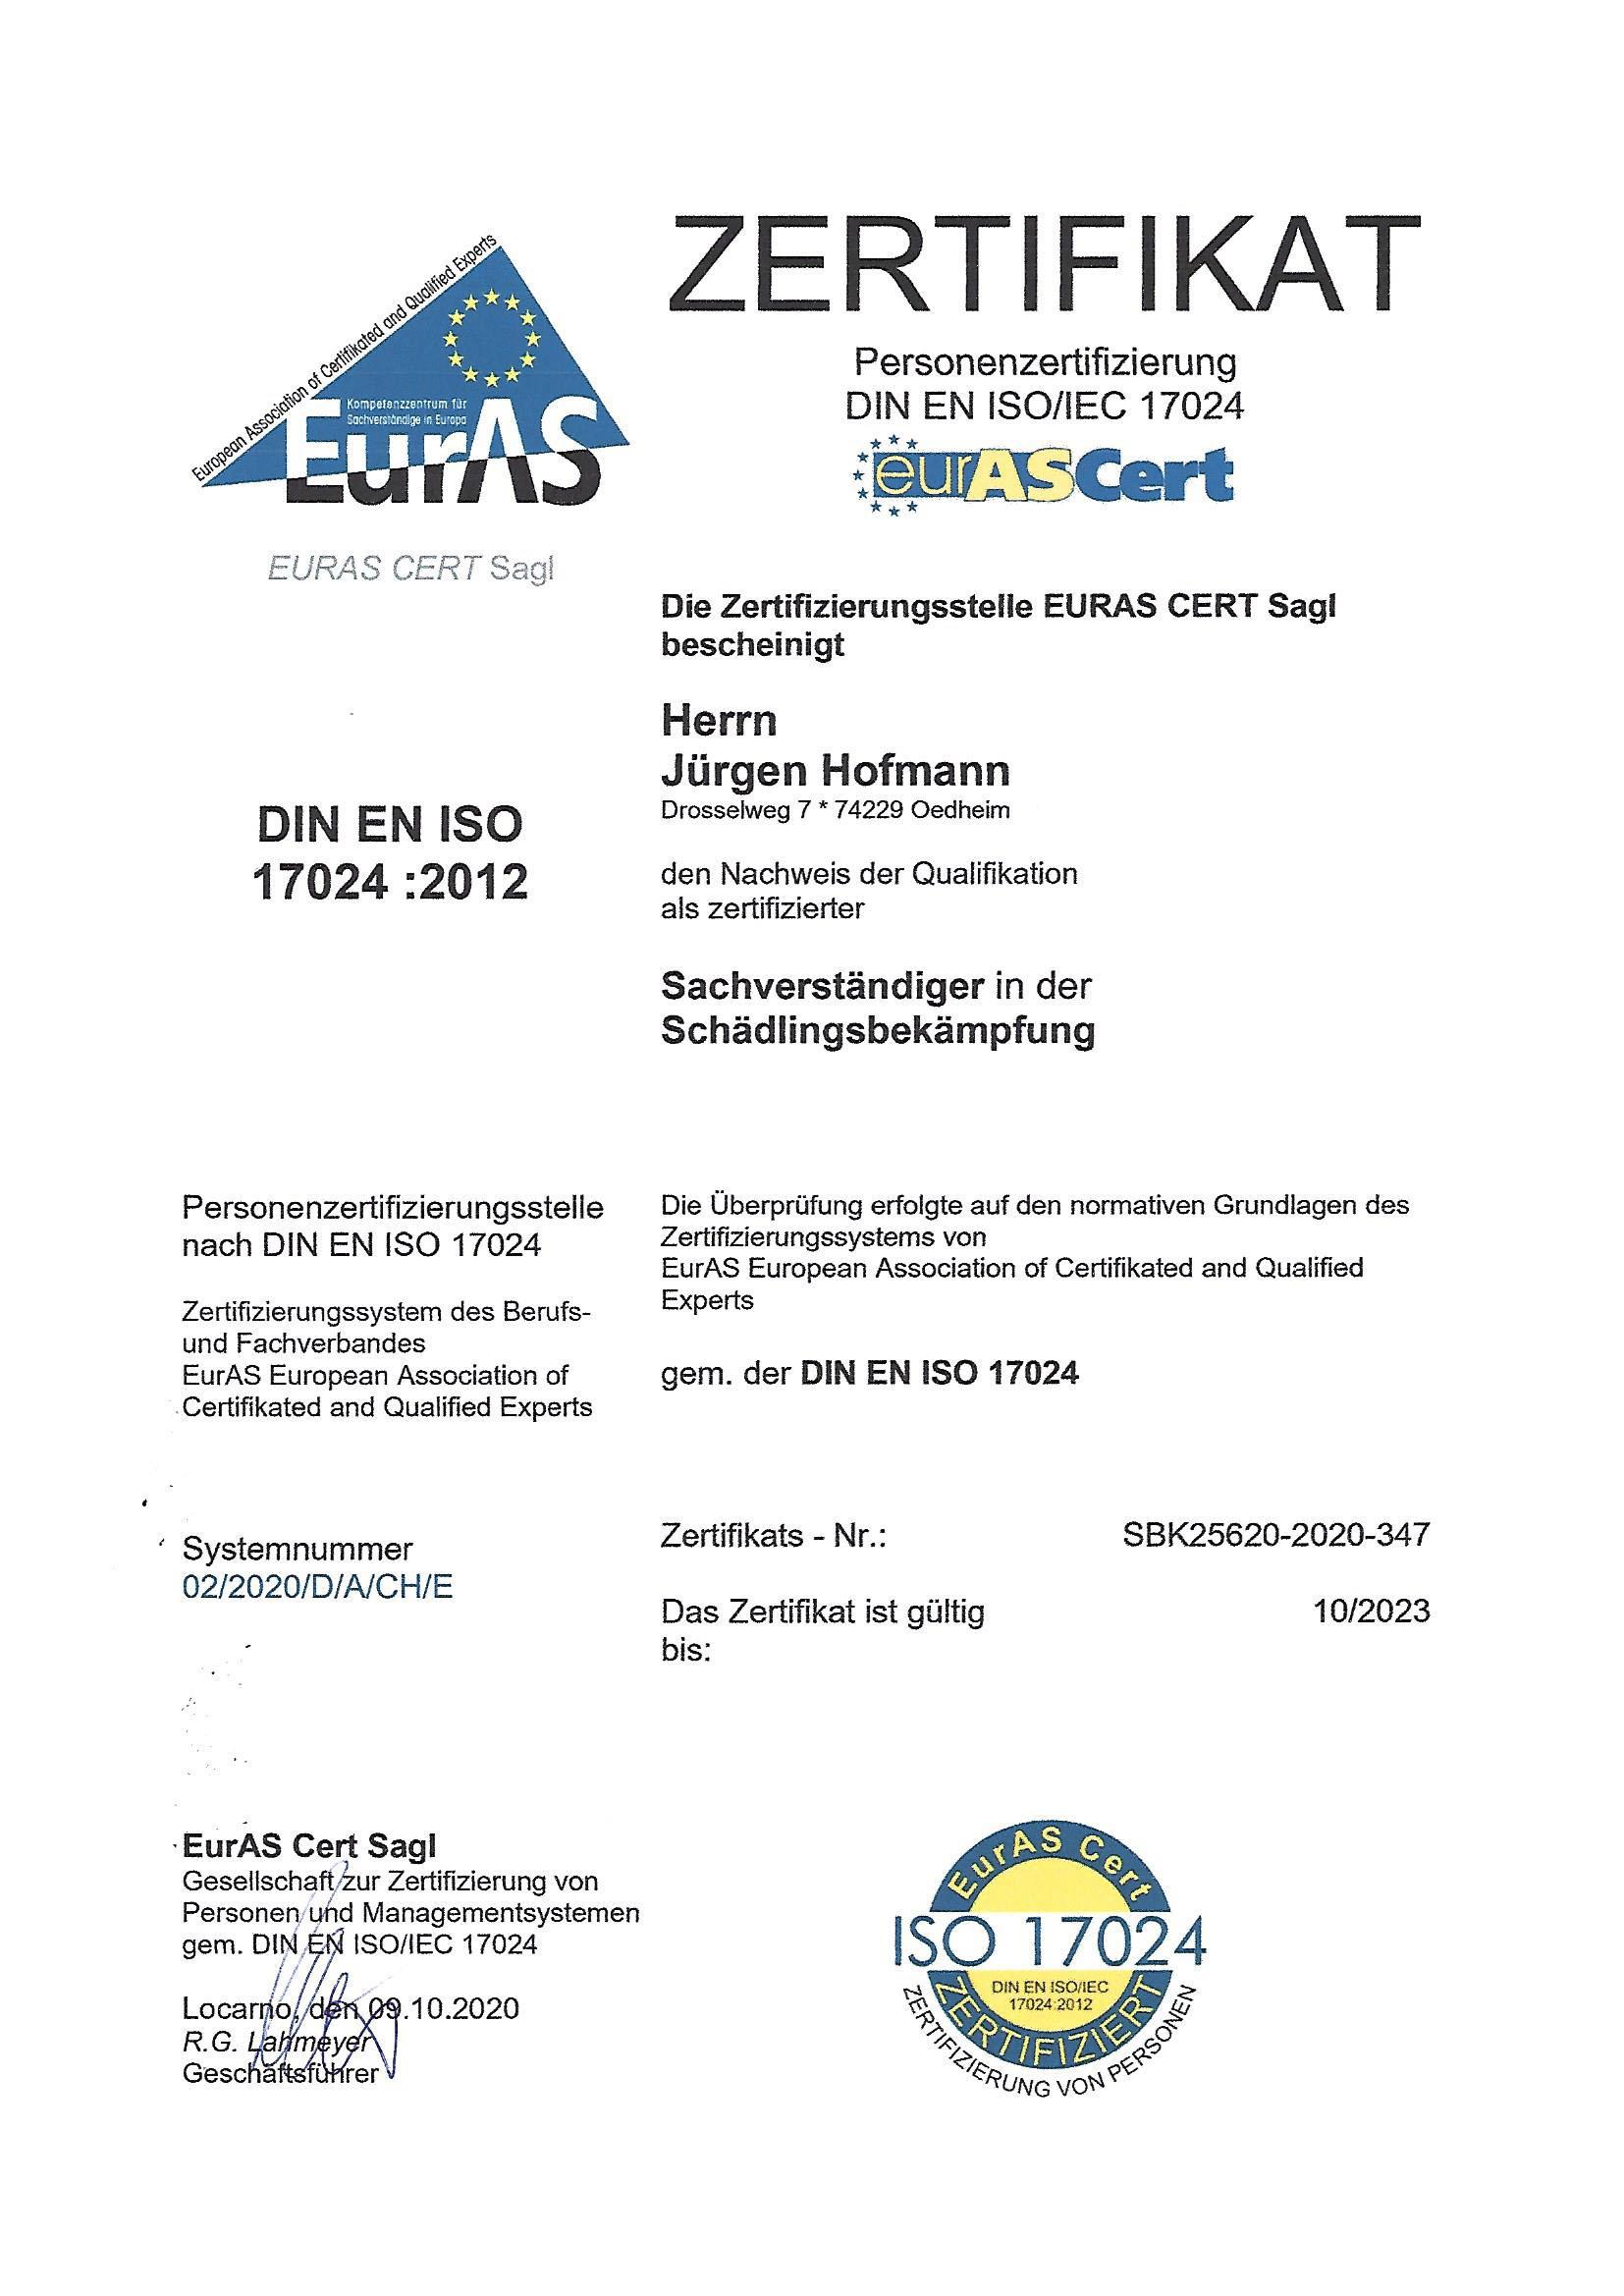 Zertifizierter Sachverständiger für Schädlingsbekämpfung gem. DIN EN ISO/IEC 17024 Schädlingsbekämpfung Hofmann Oedheim